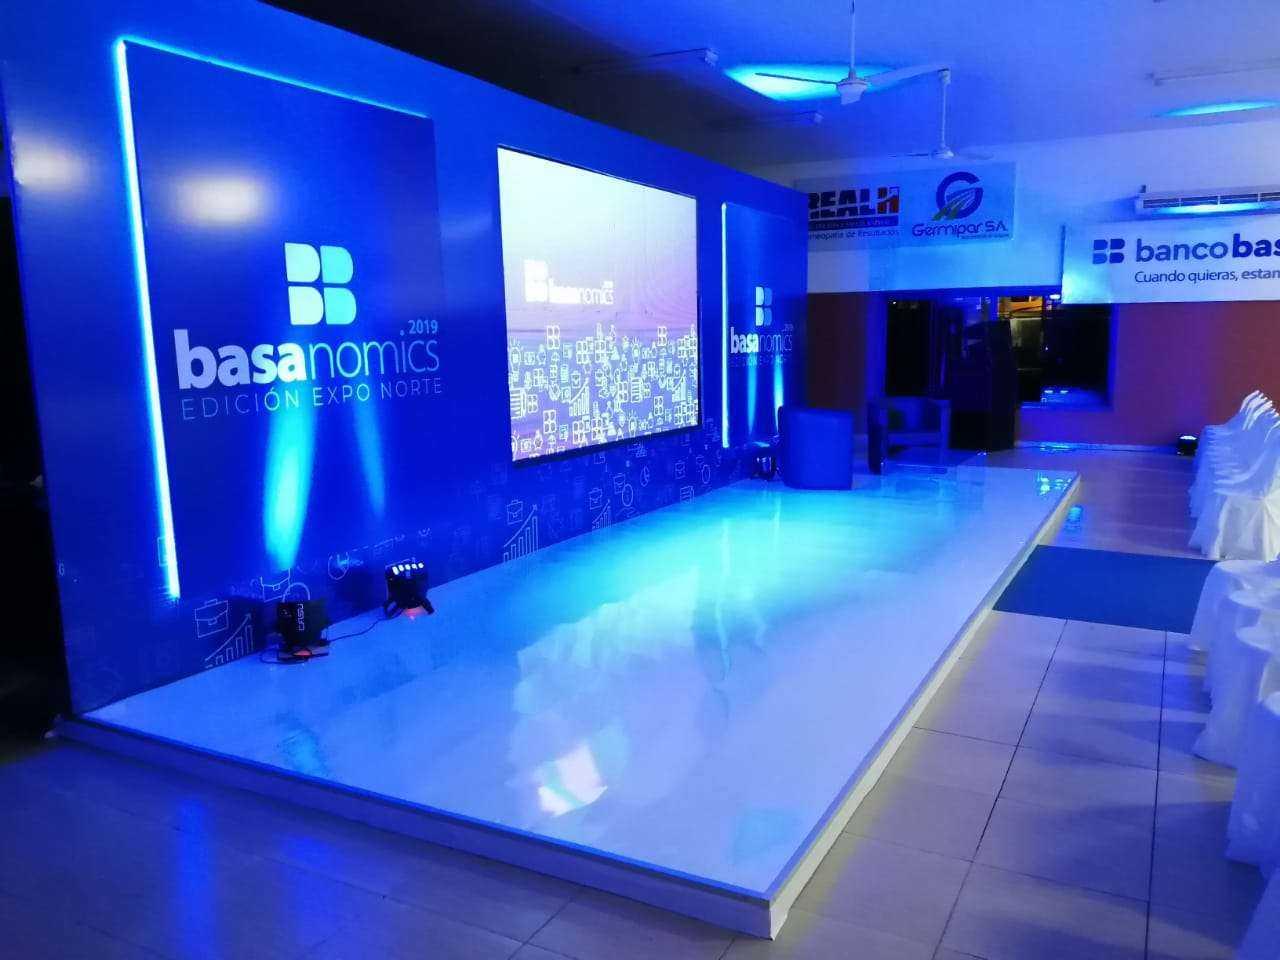 Basanomics-Expo Norte Concepción 1